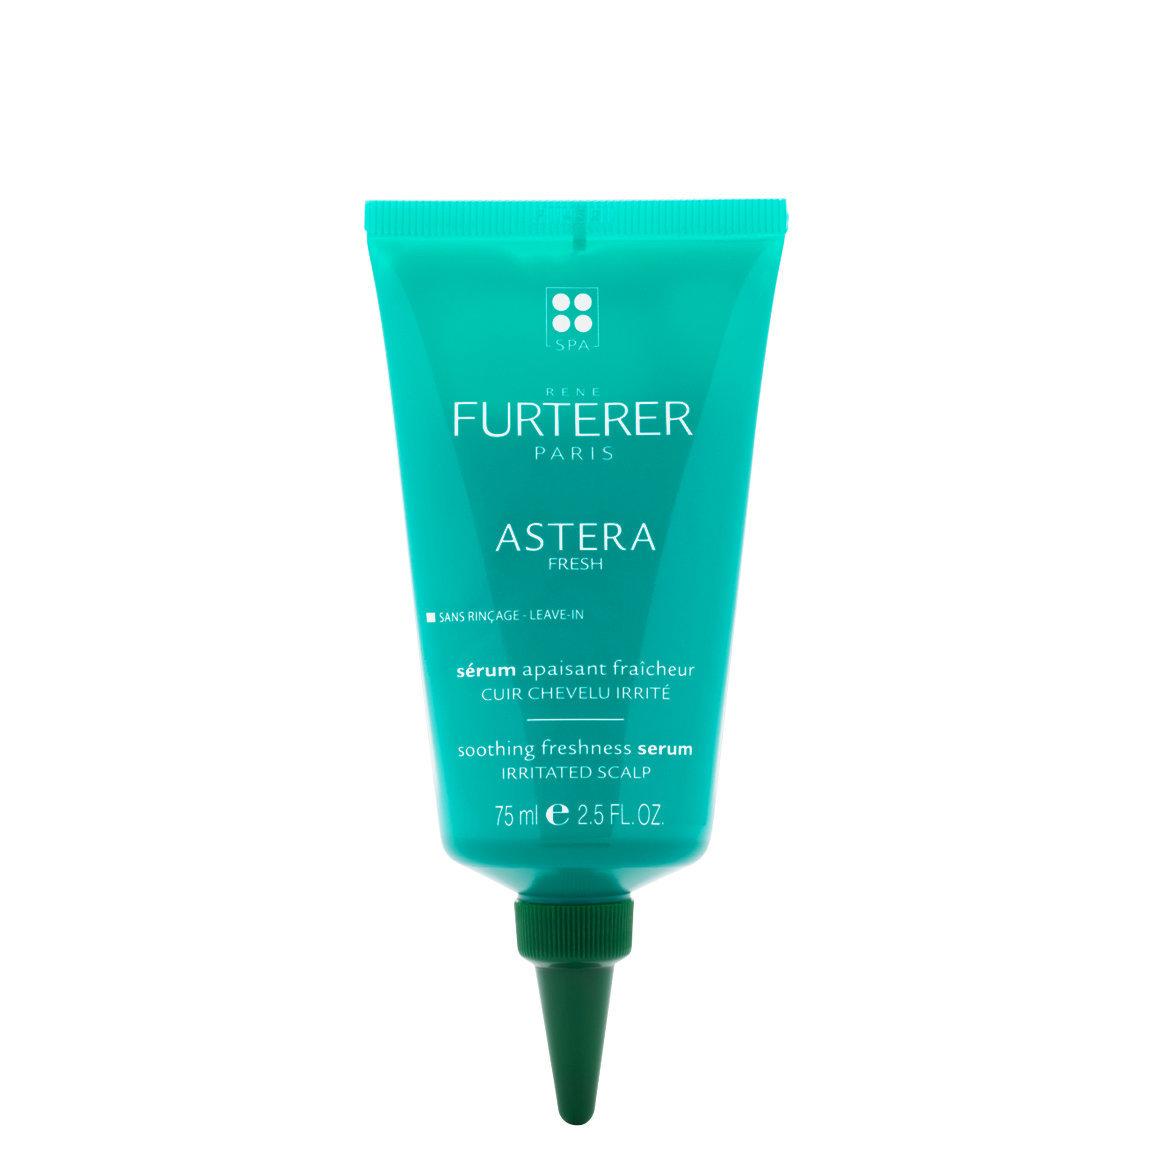 Rene Furterer Astera Fresh Soothing Freshness Serum product swatch.